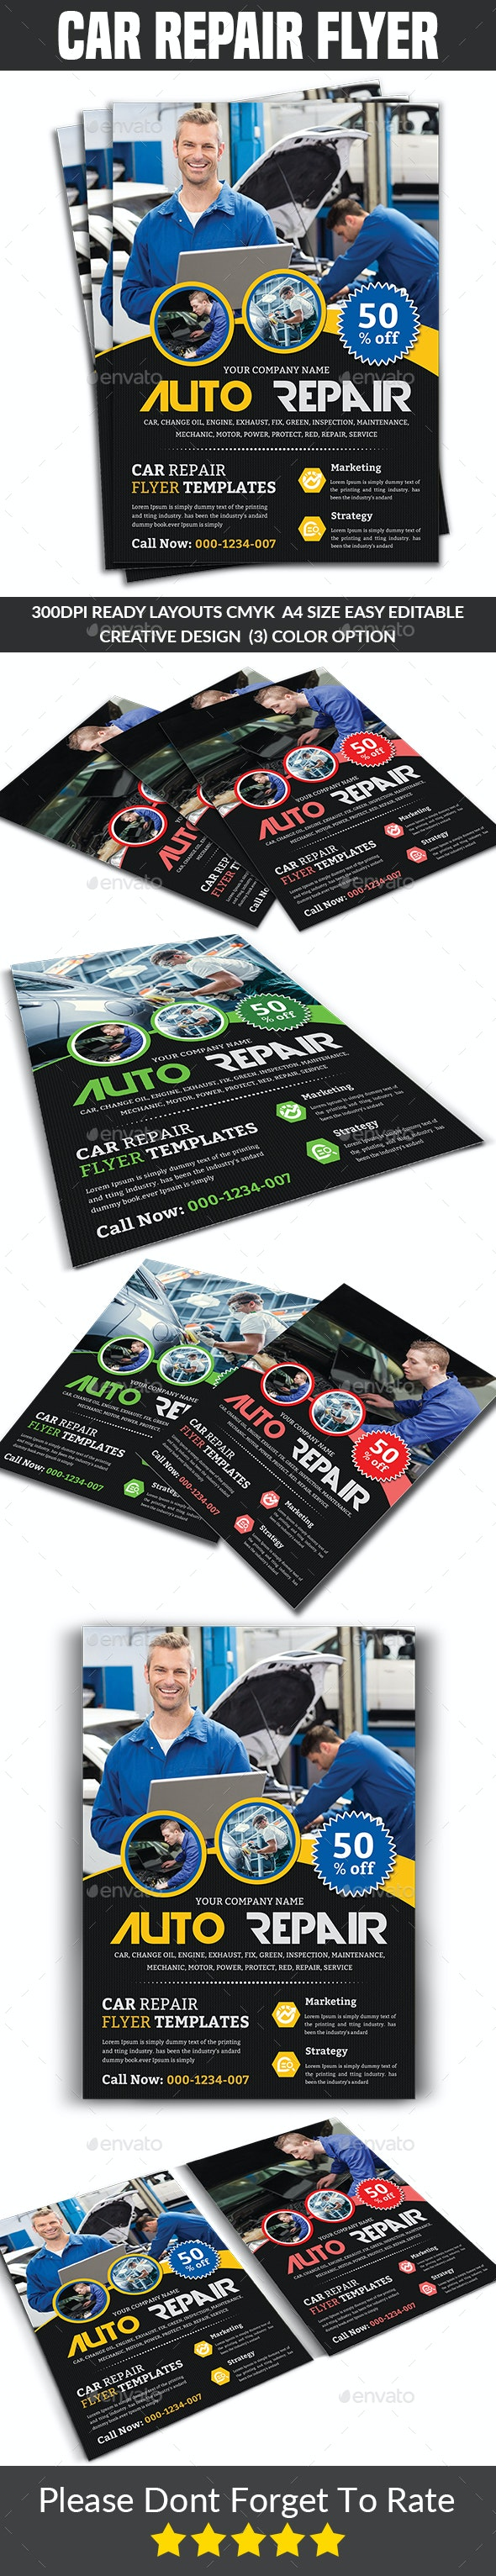 Car Repair Flyer - Corporate Flyers